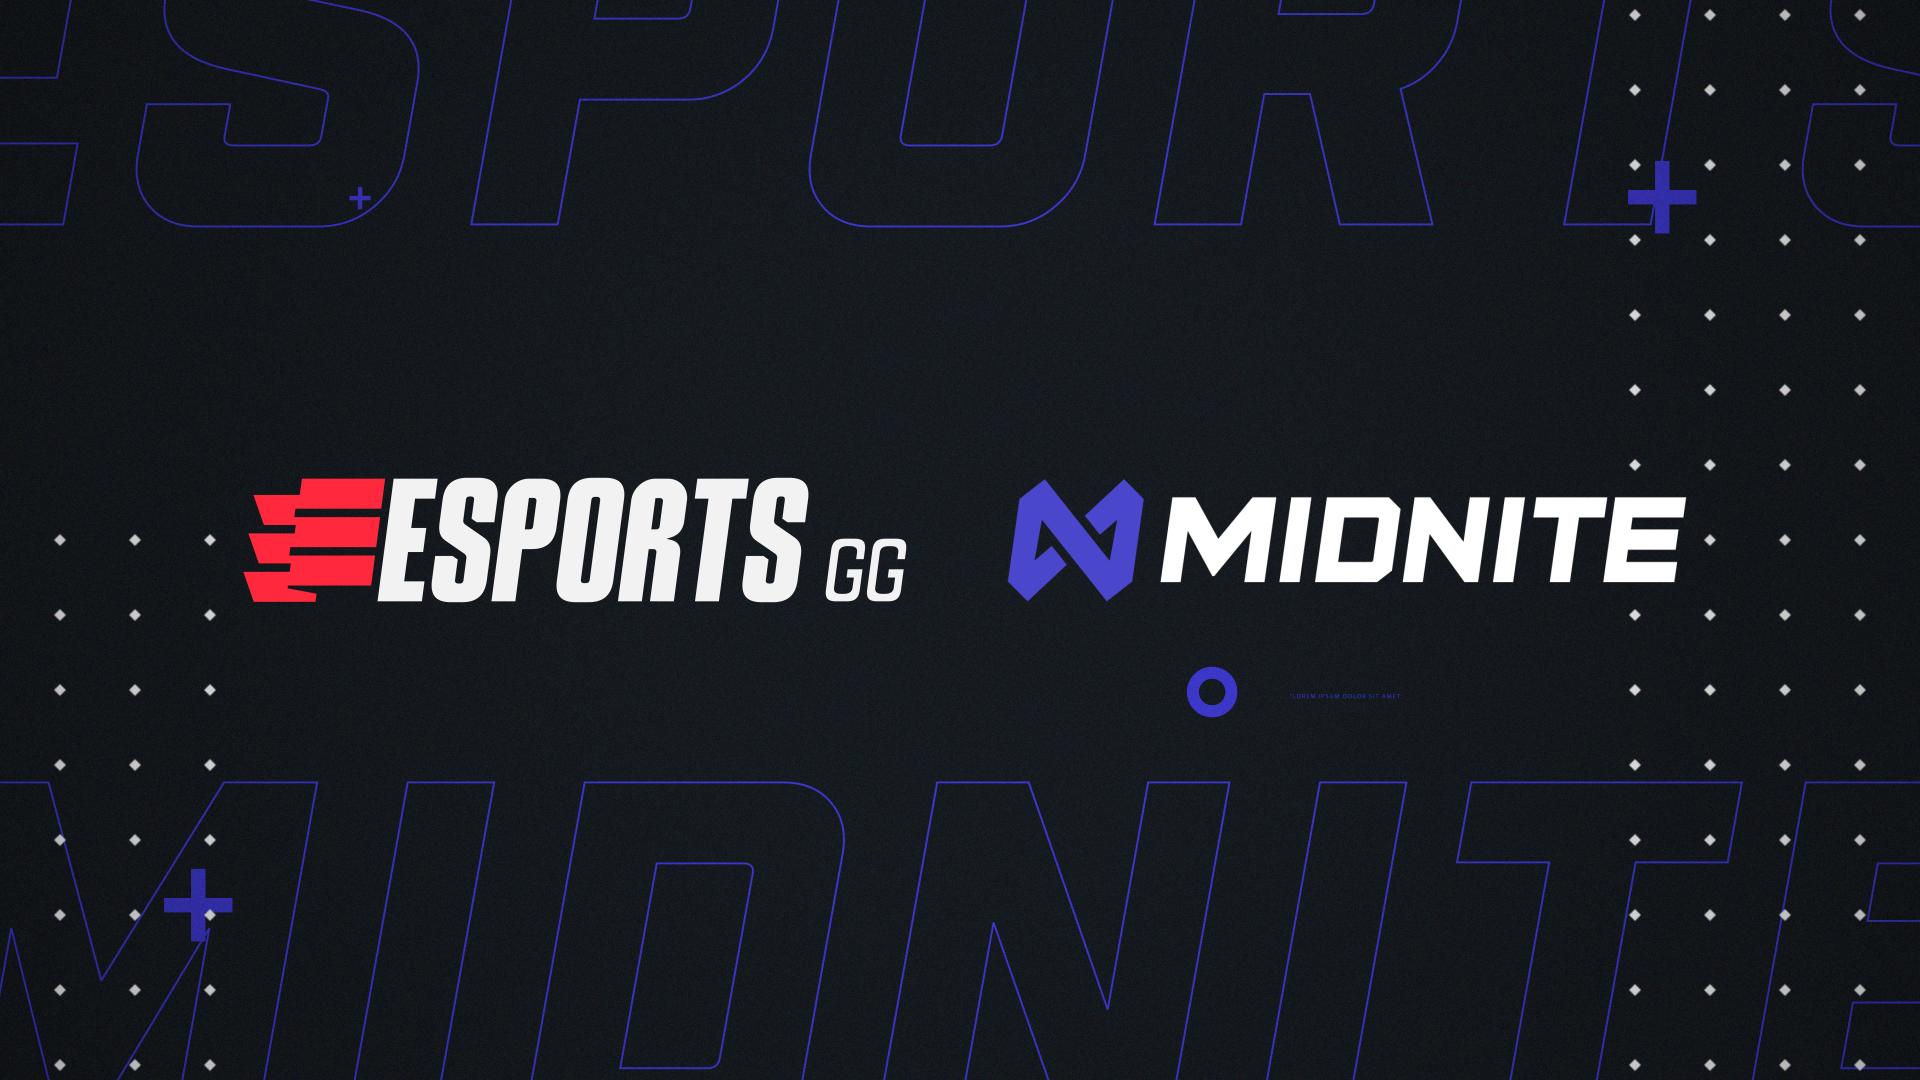 Esports Media announces Midnite partnership for Esports.gg thumbnail